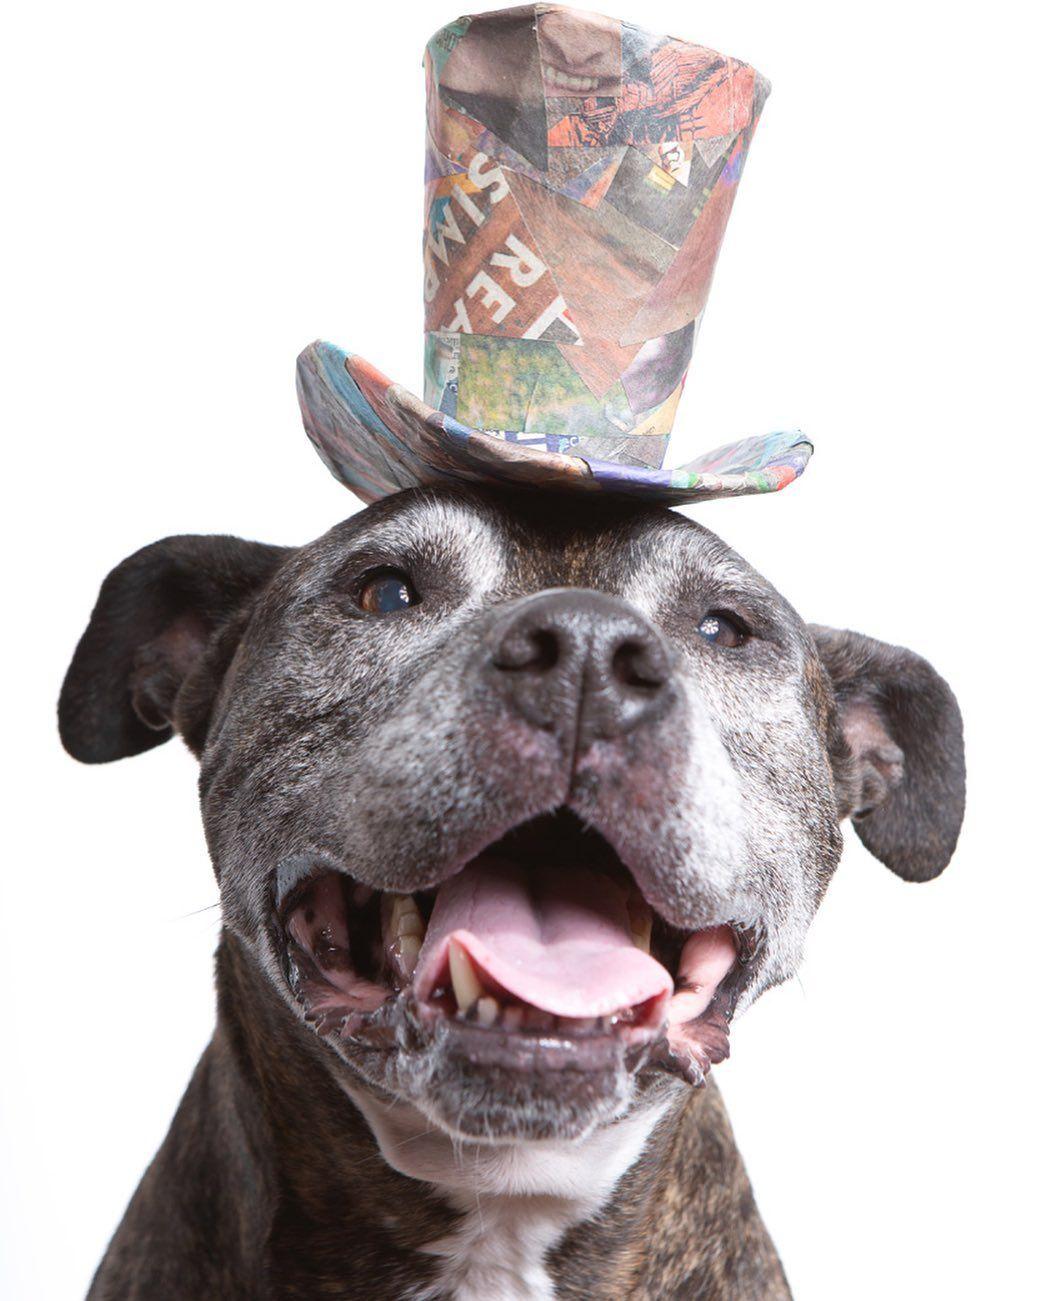 Dog With Hat Maker : maker, Happy, National, #nationaldogday, #dogs, #seniordog, #sugarface, #tophat, #hatmaker, #dogportrait, #dogphotograp…, Photograph,